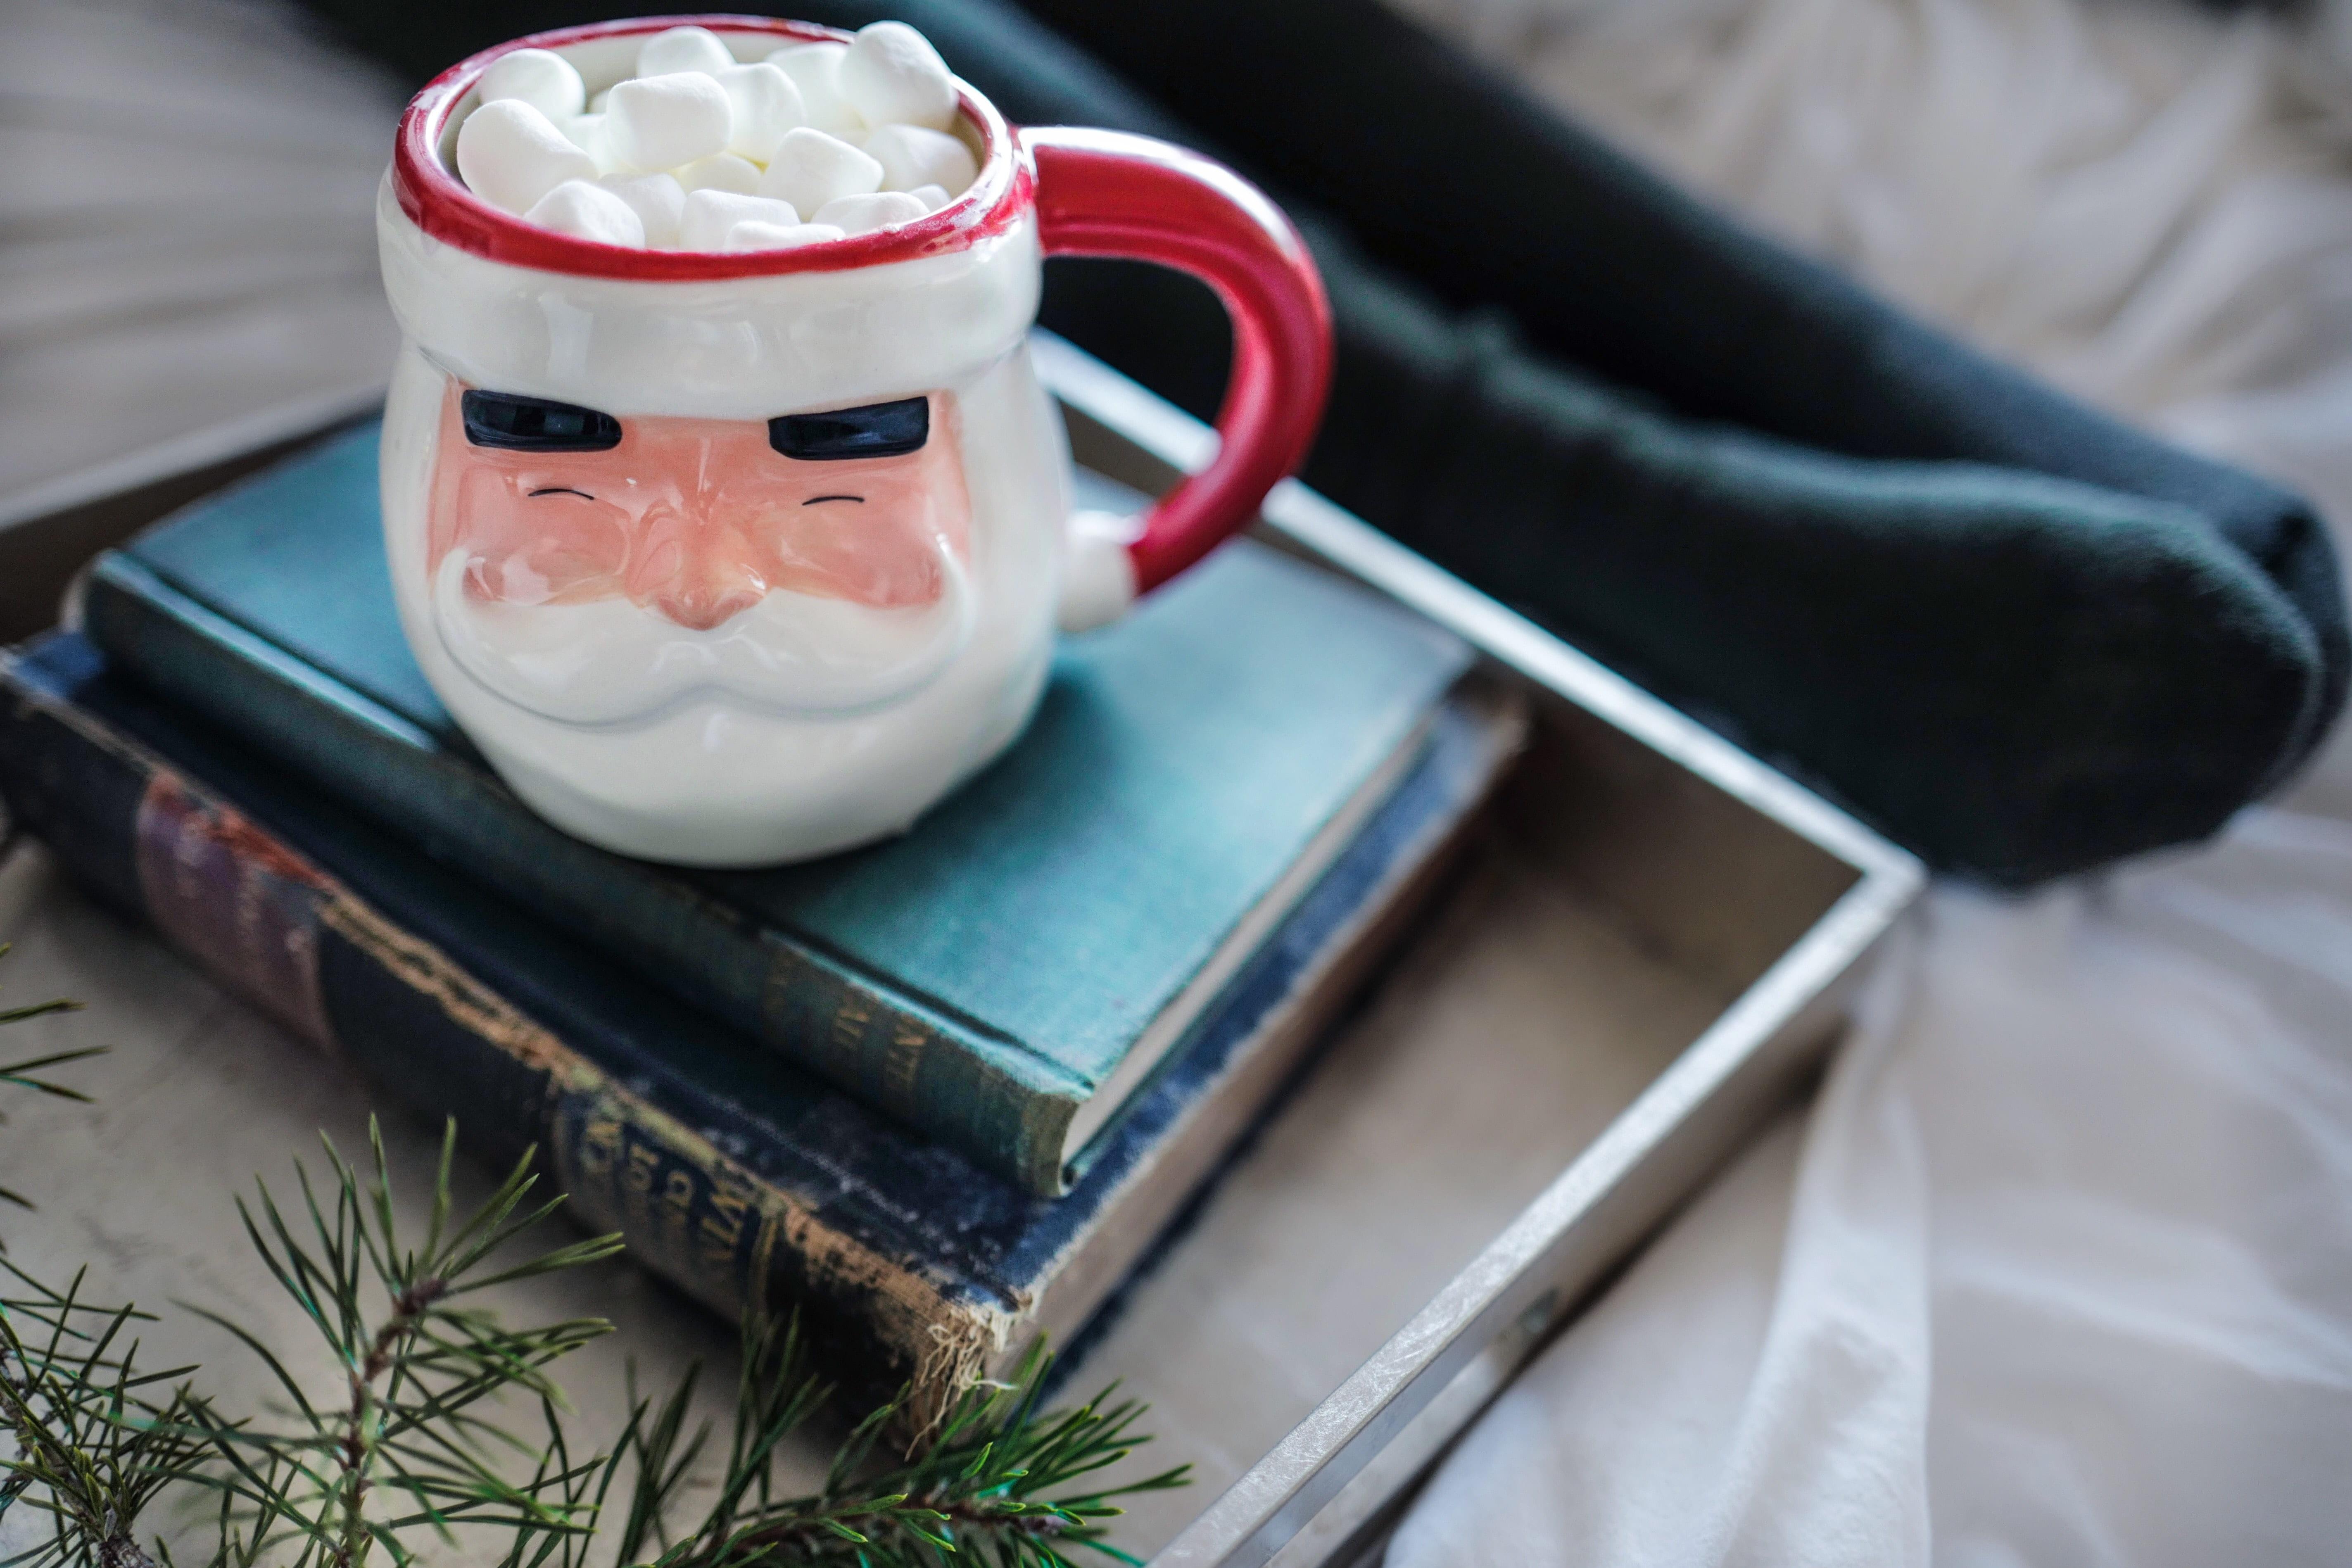 Santa shaped mug sat on stack of books